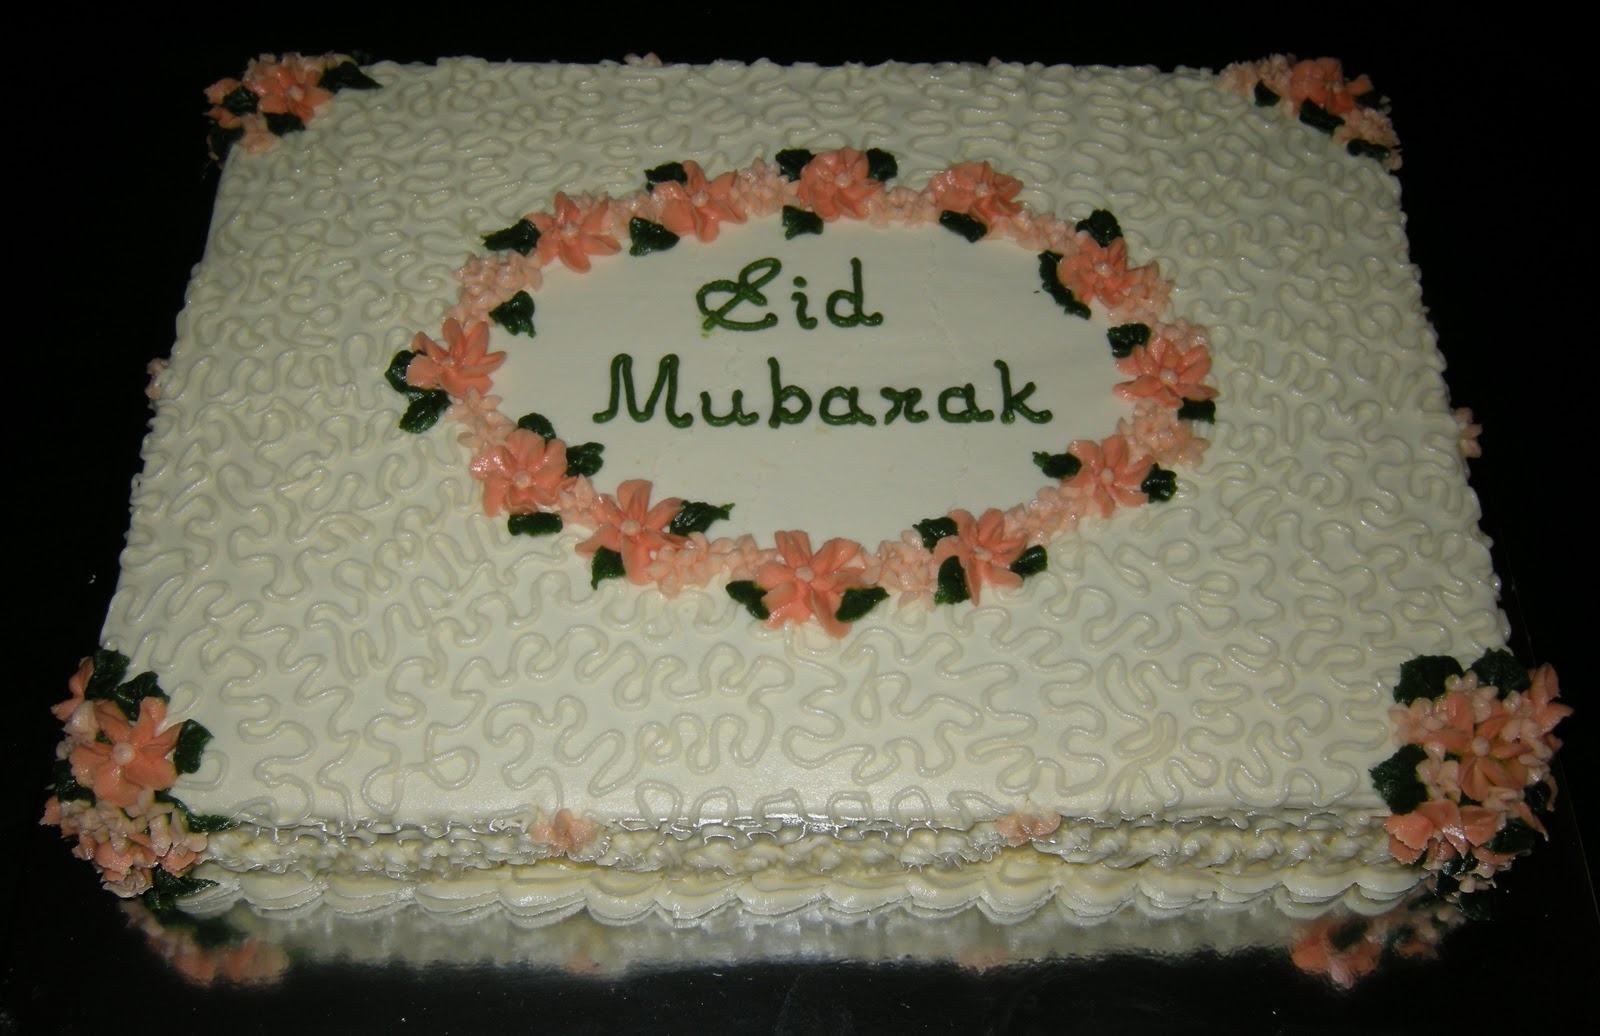 N Mehndi Cake : Most popular eid mubarak cake toppers 2018 !!! latest